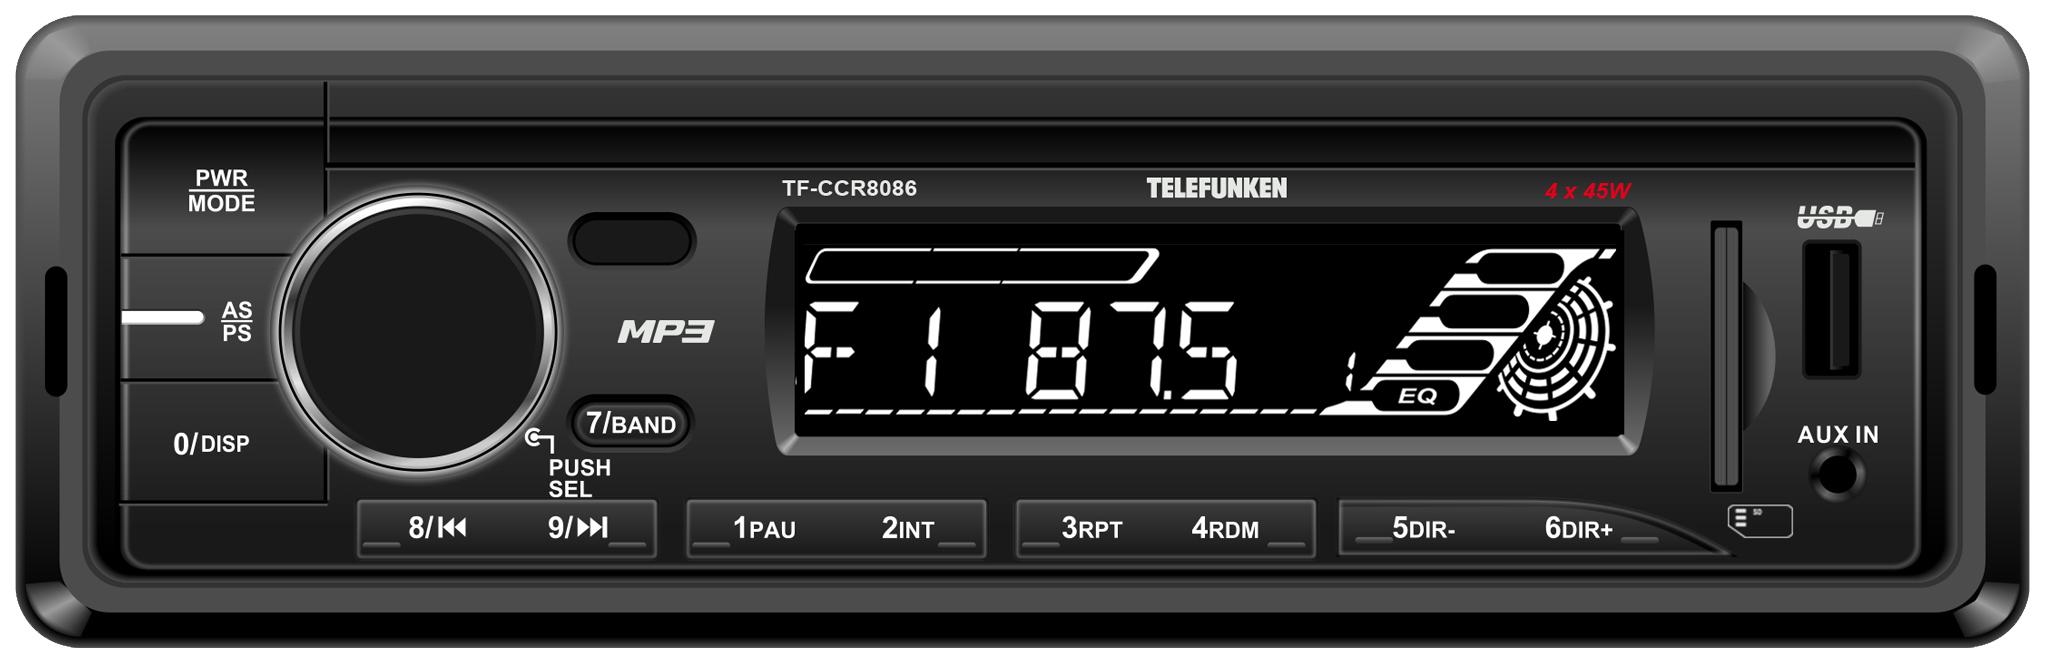 CAM Telefunken TF-CCR8086